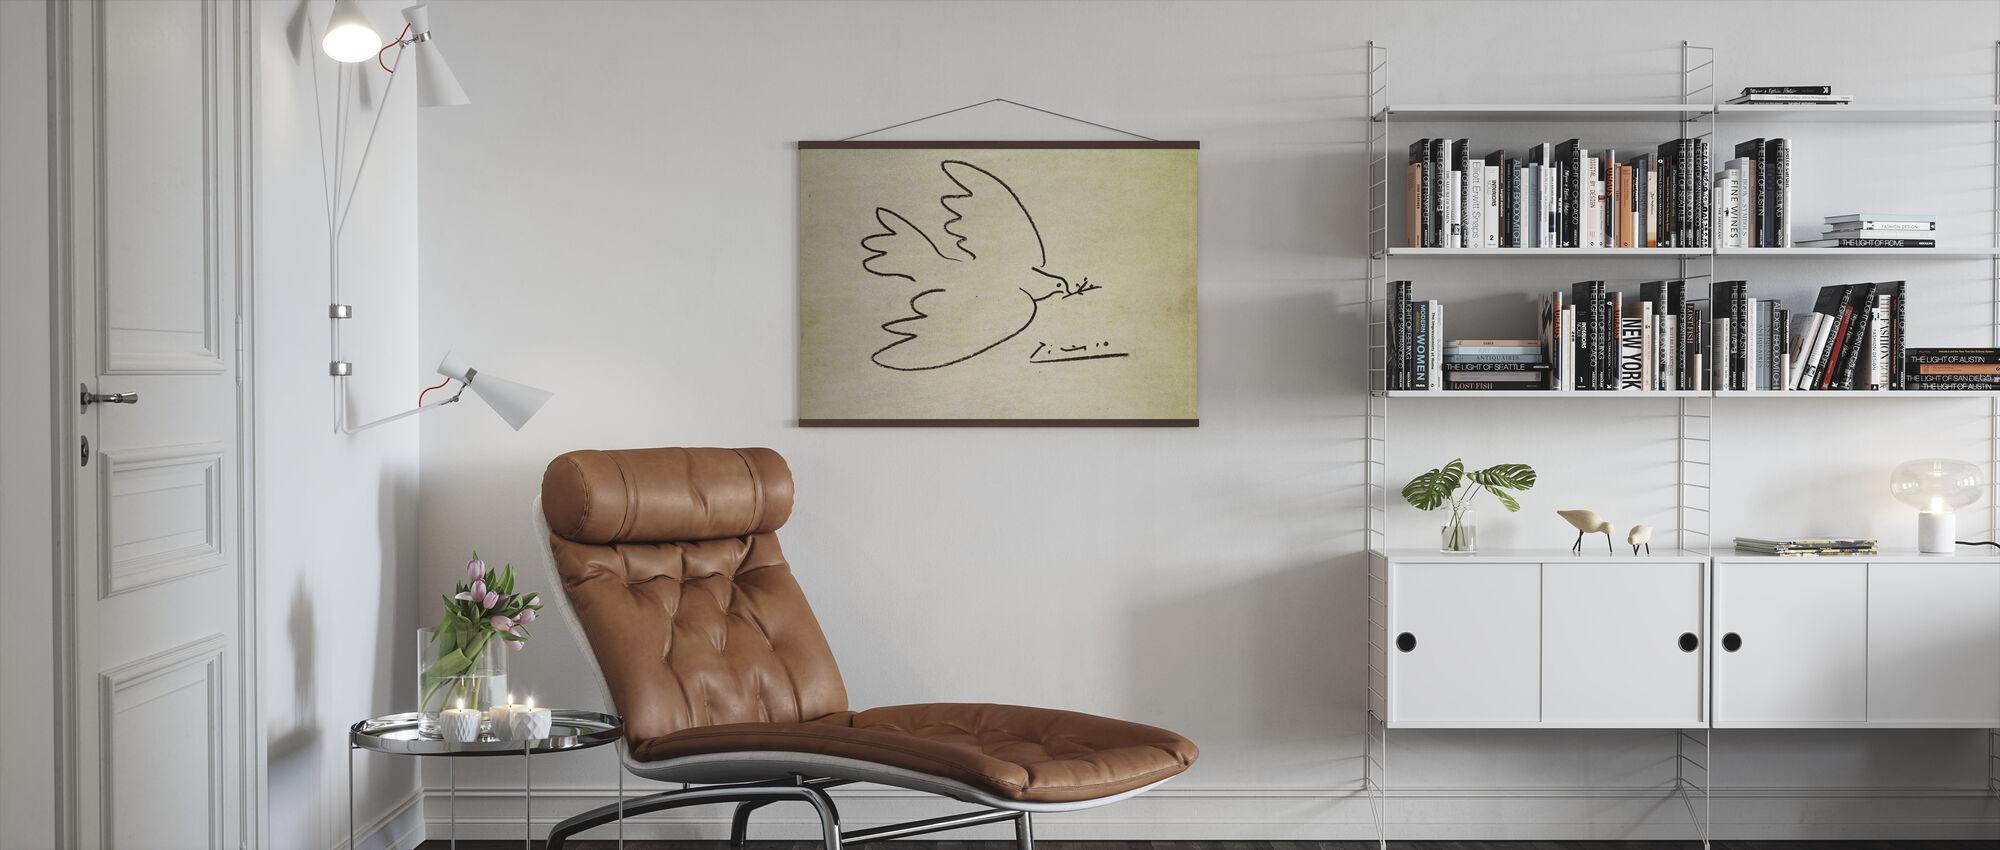 Var - Pablo Picasso - Poster - Vardagsrum